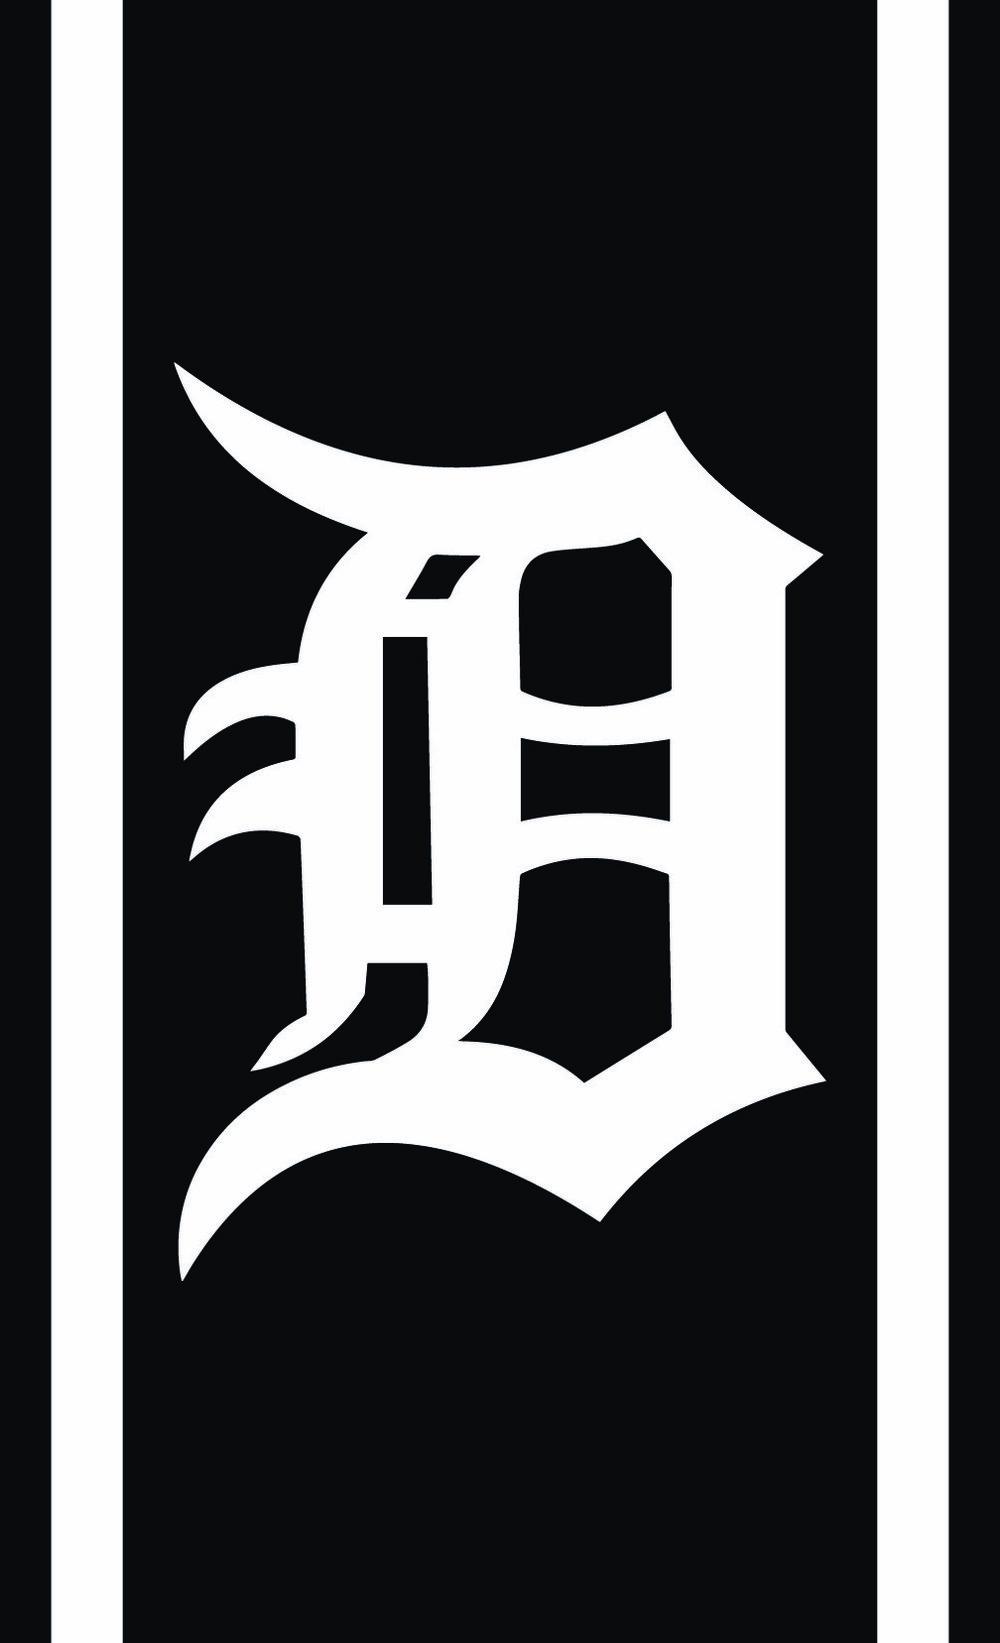 Sports // Detroit D Stripes // 14x23 // $65